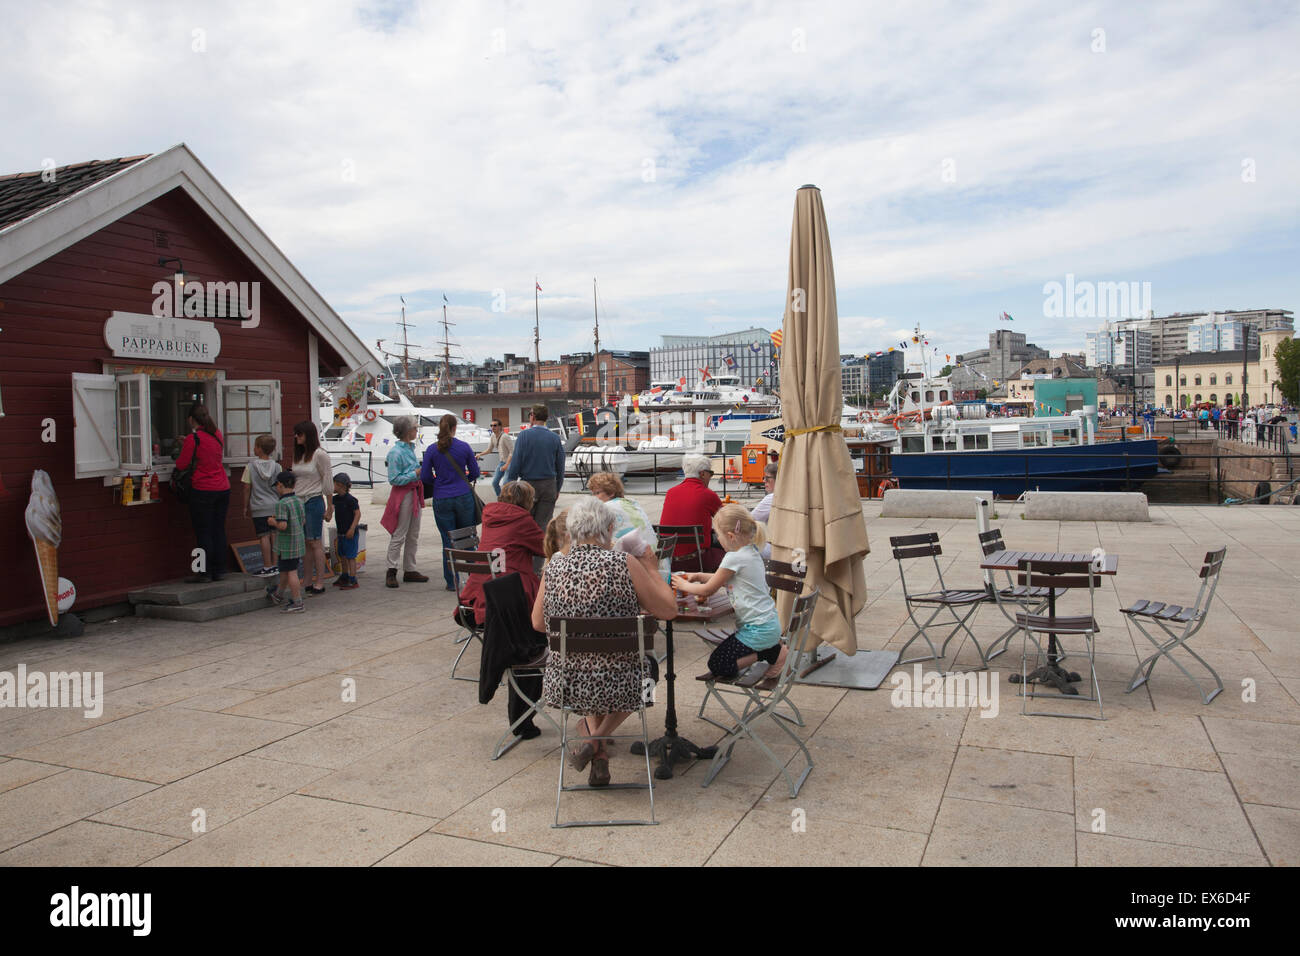 Pappabuene restaurant, Radhusbrygge, Oslo harbour, Oslo sentrum, Oslo, Norway - Stock Image